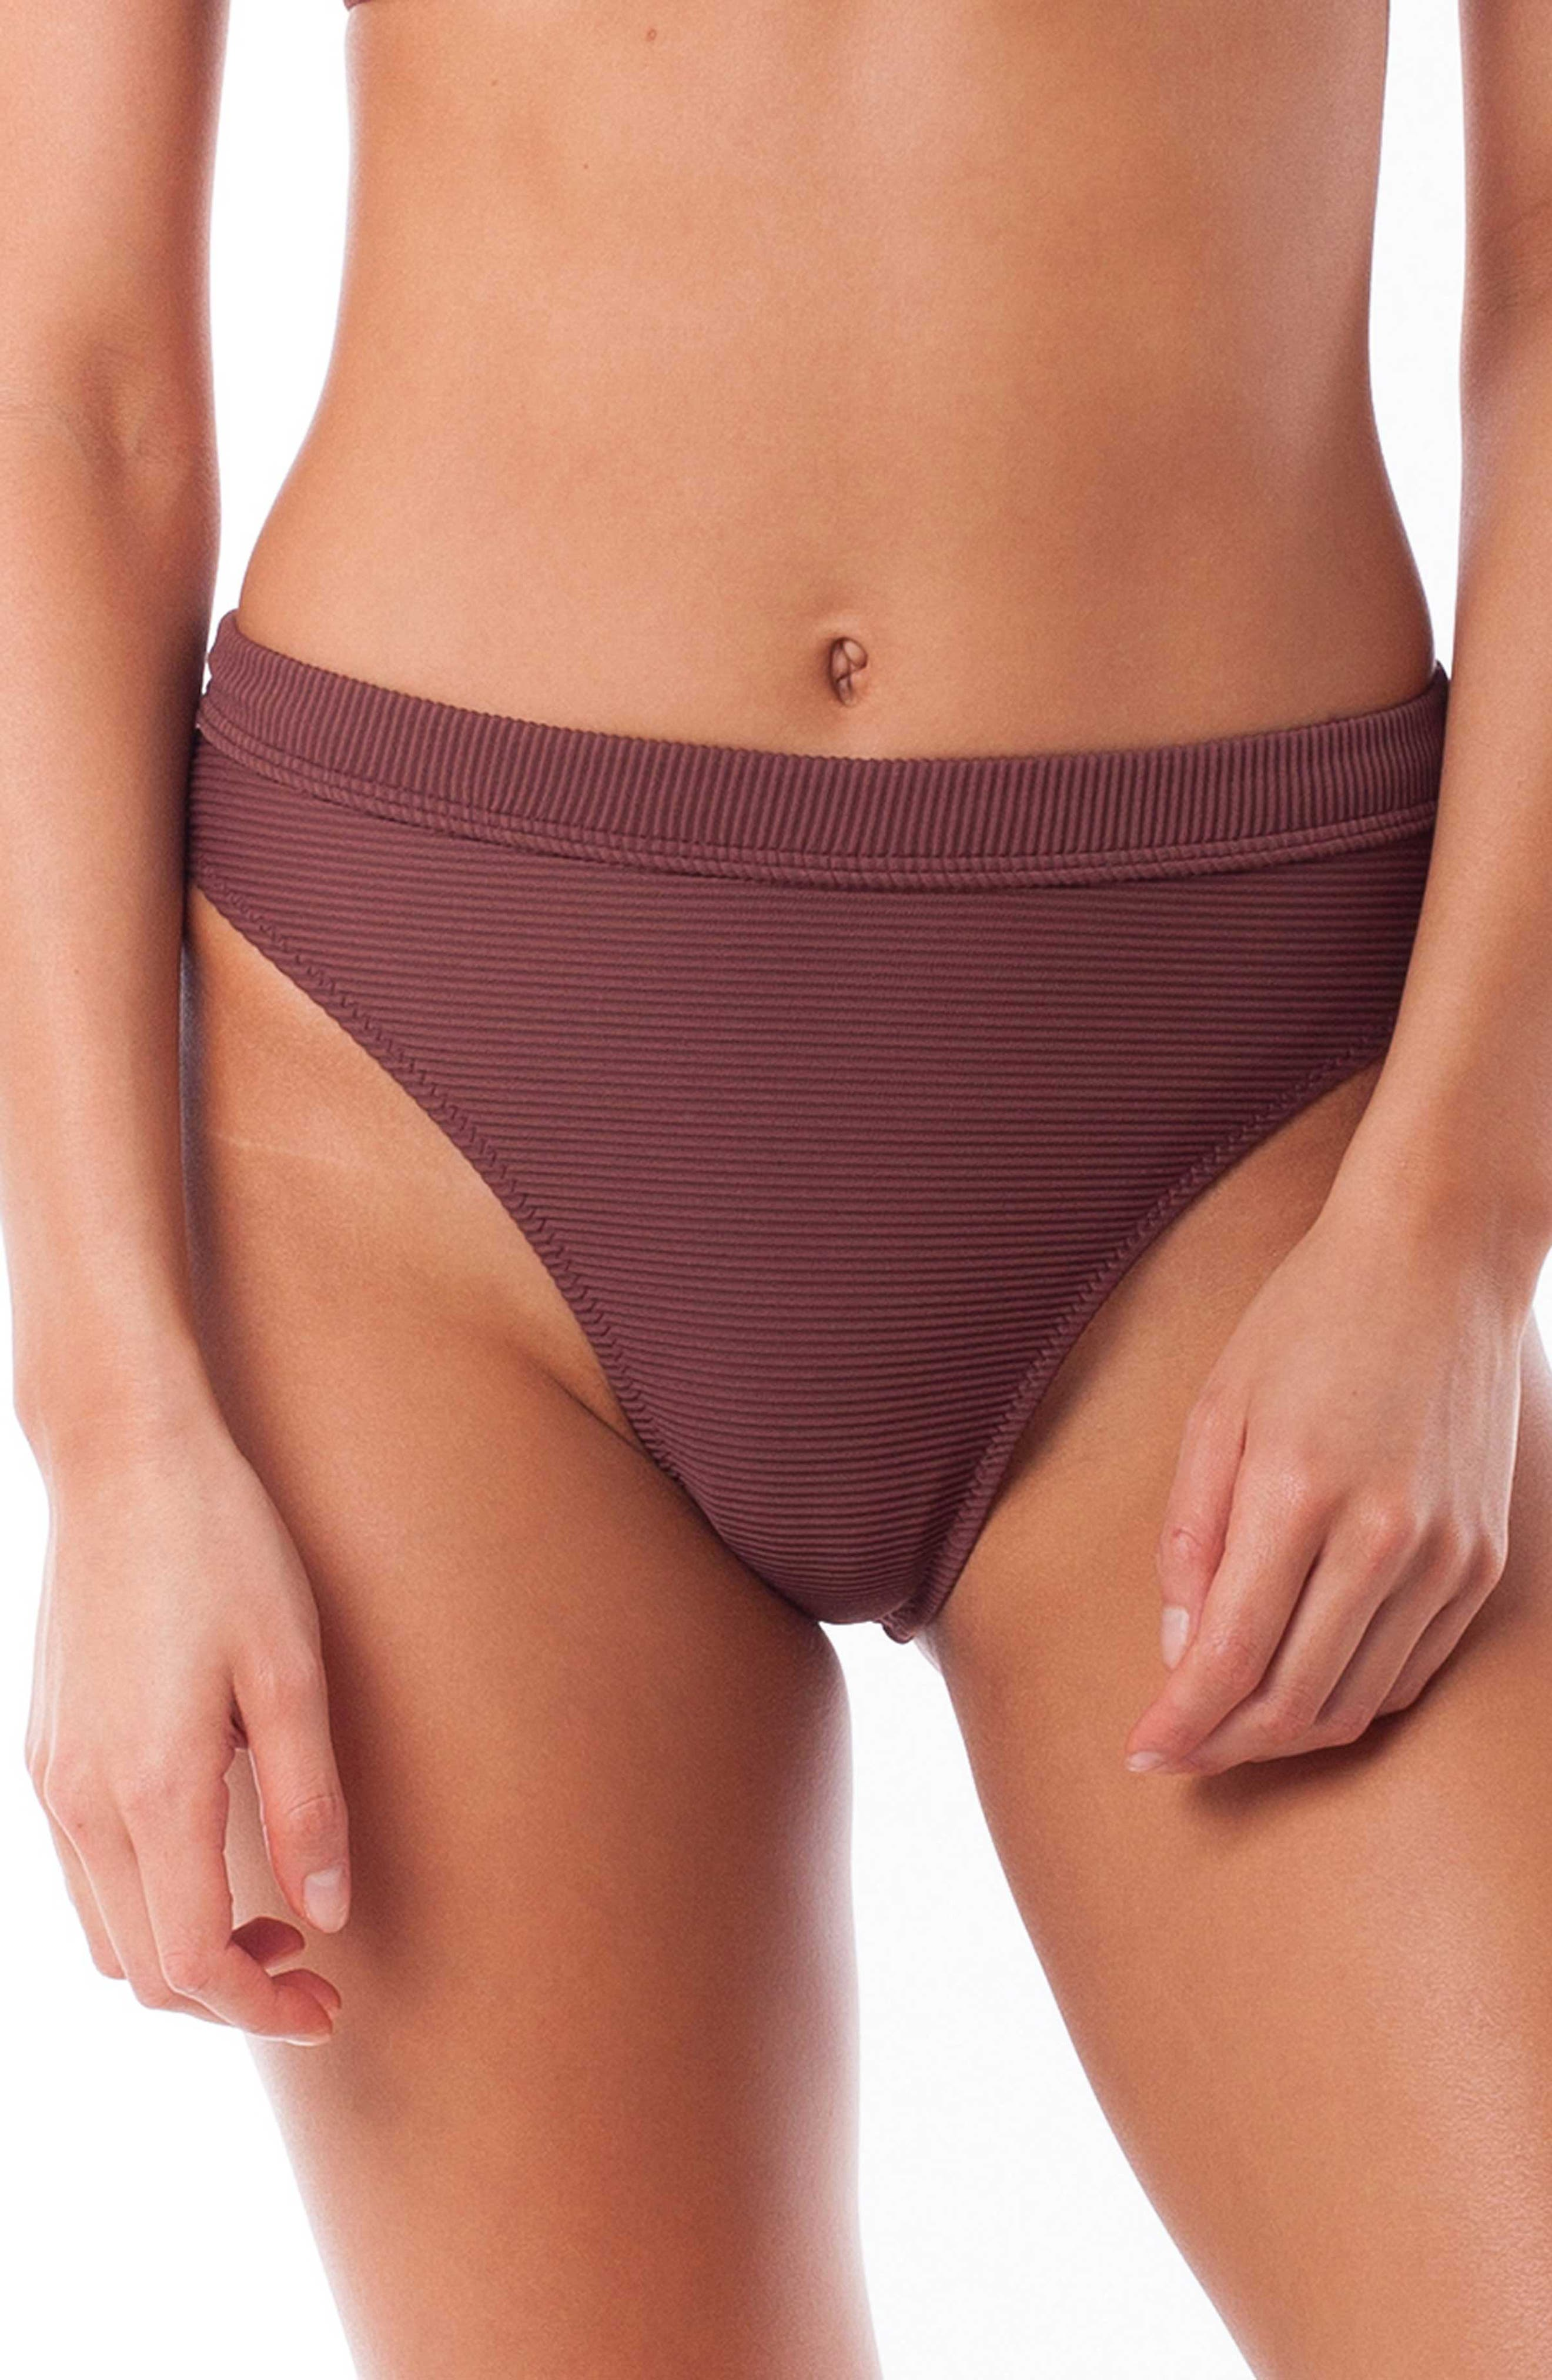 Rhythm Palm Springs Xanadu Bikini Bottoms, Burgundy